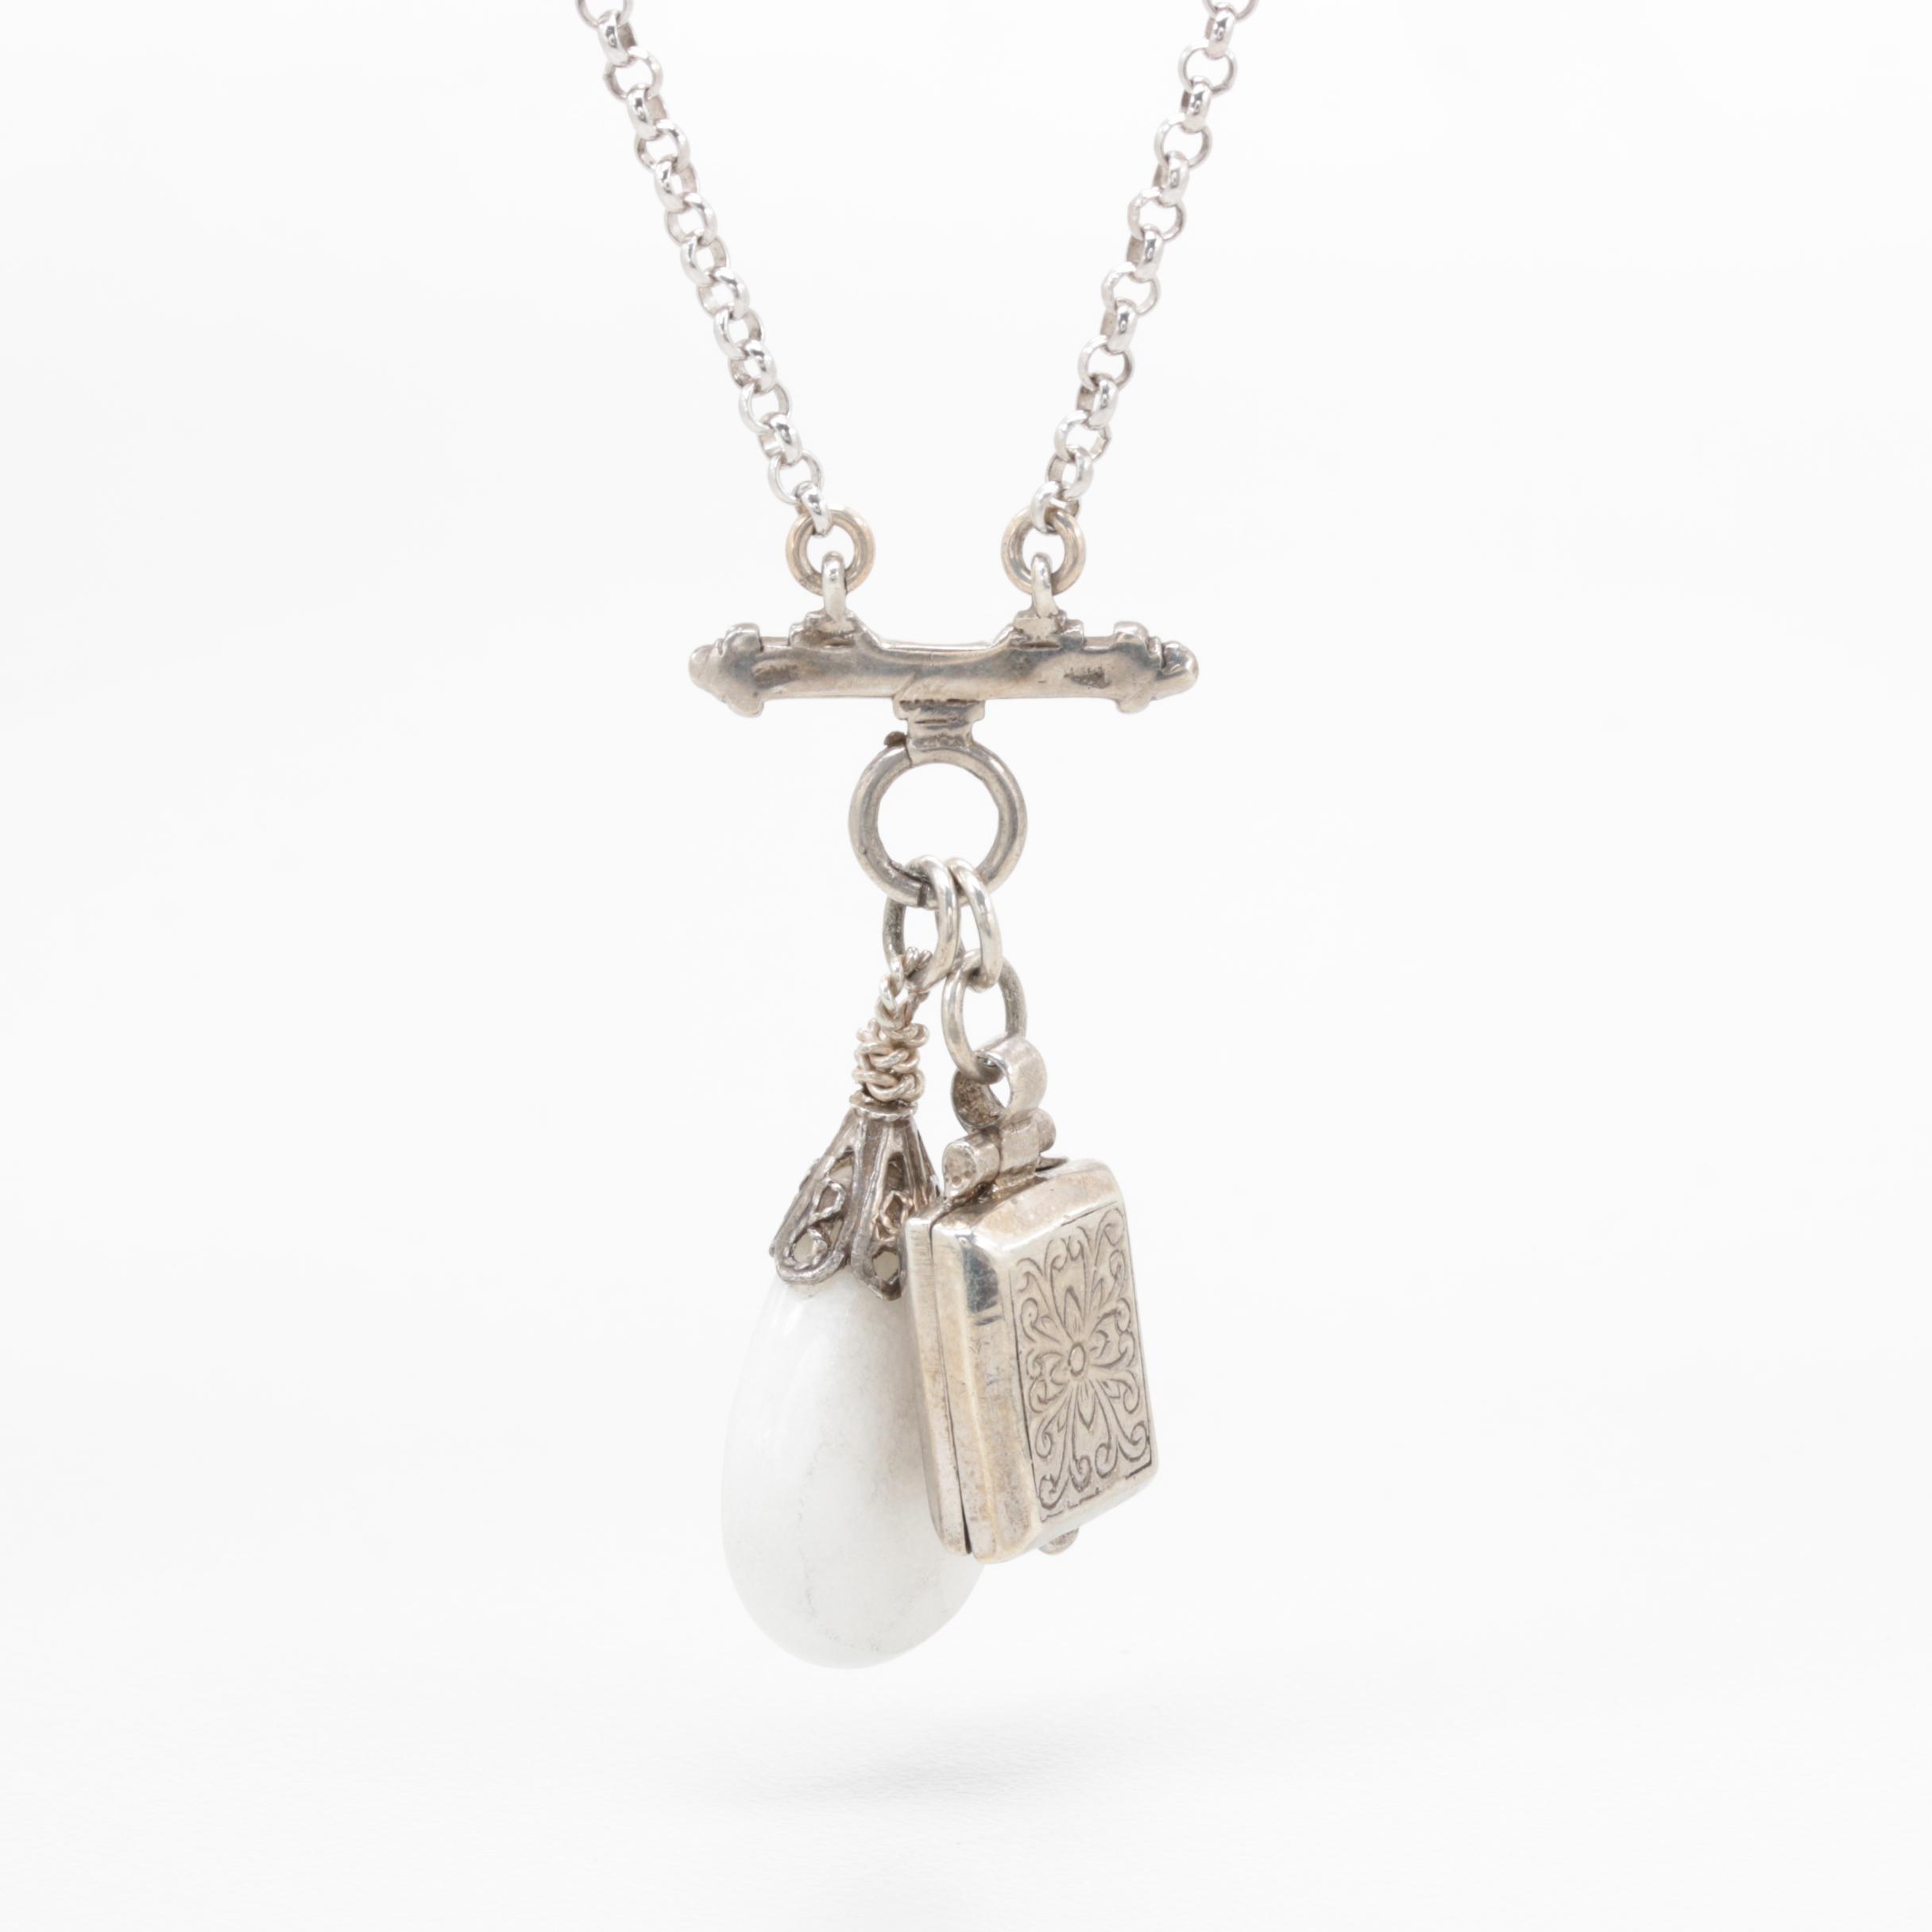 Sterling Silver Quartzite Locket Pendant Necklace